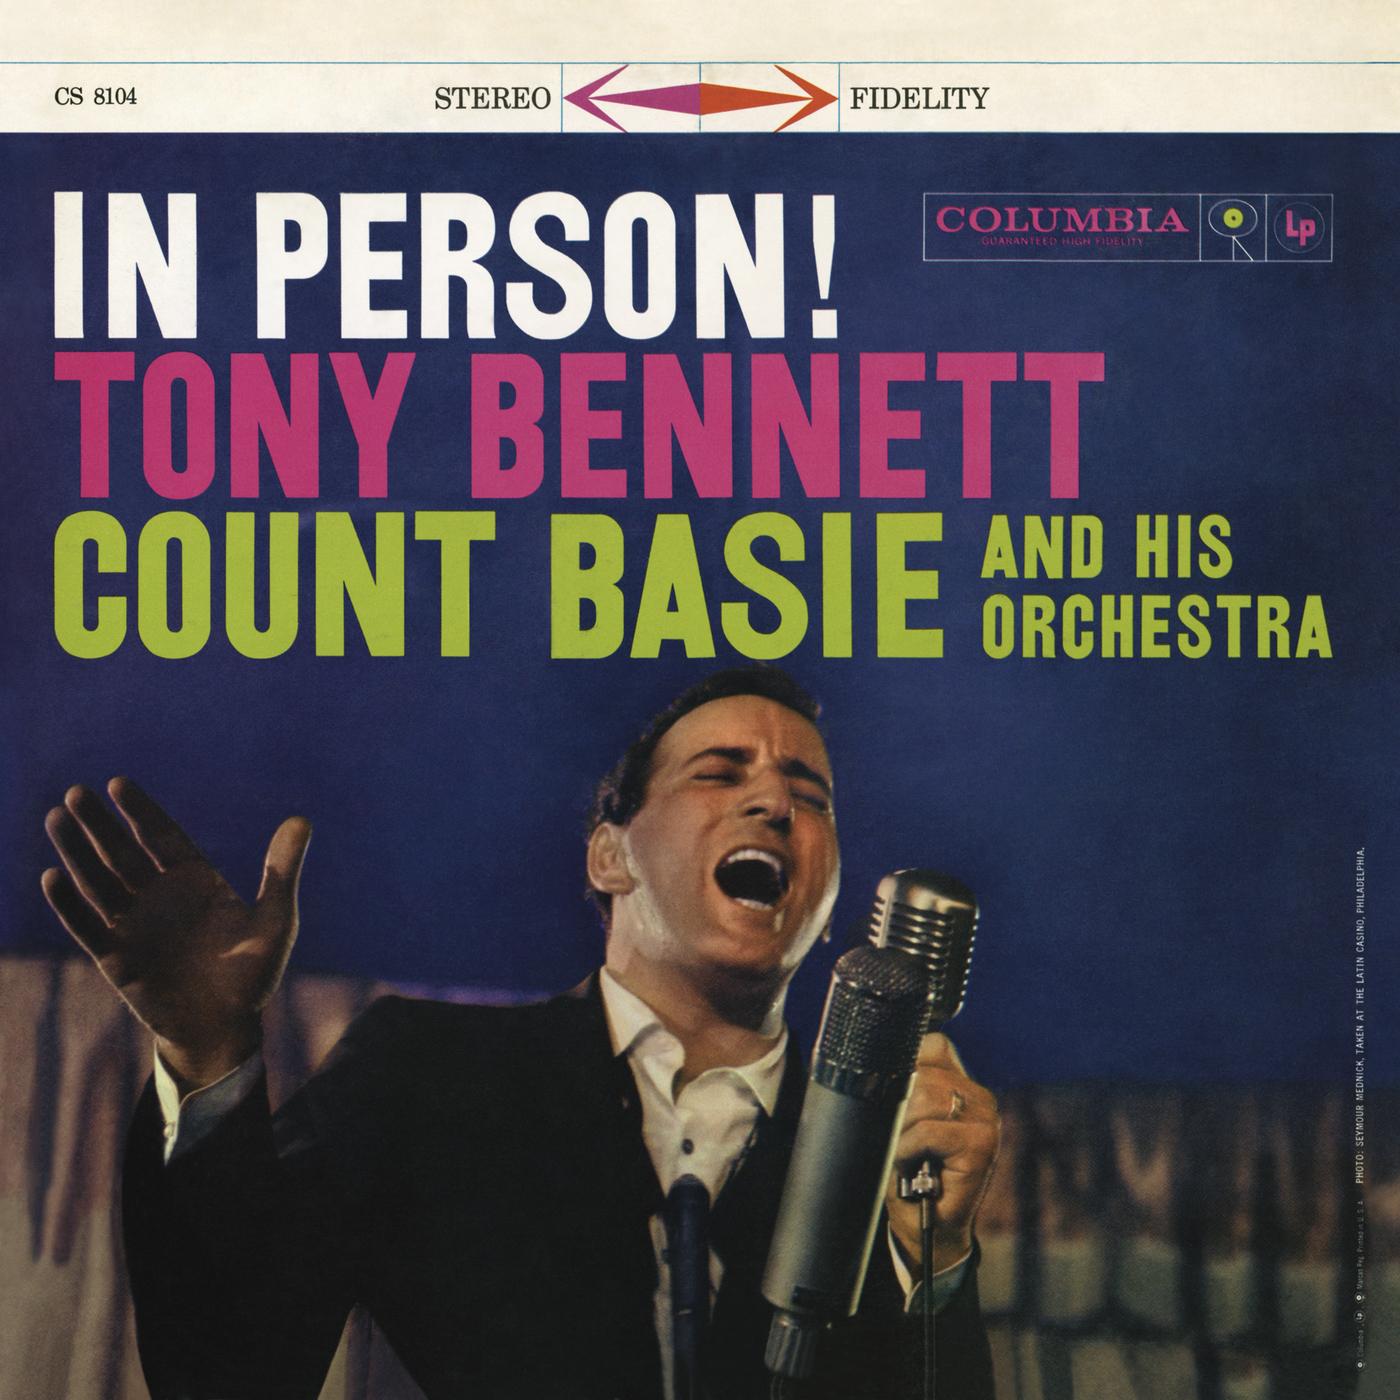 In Person! - Tony Bennett